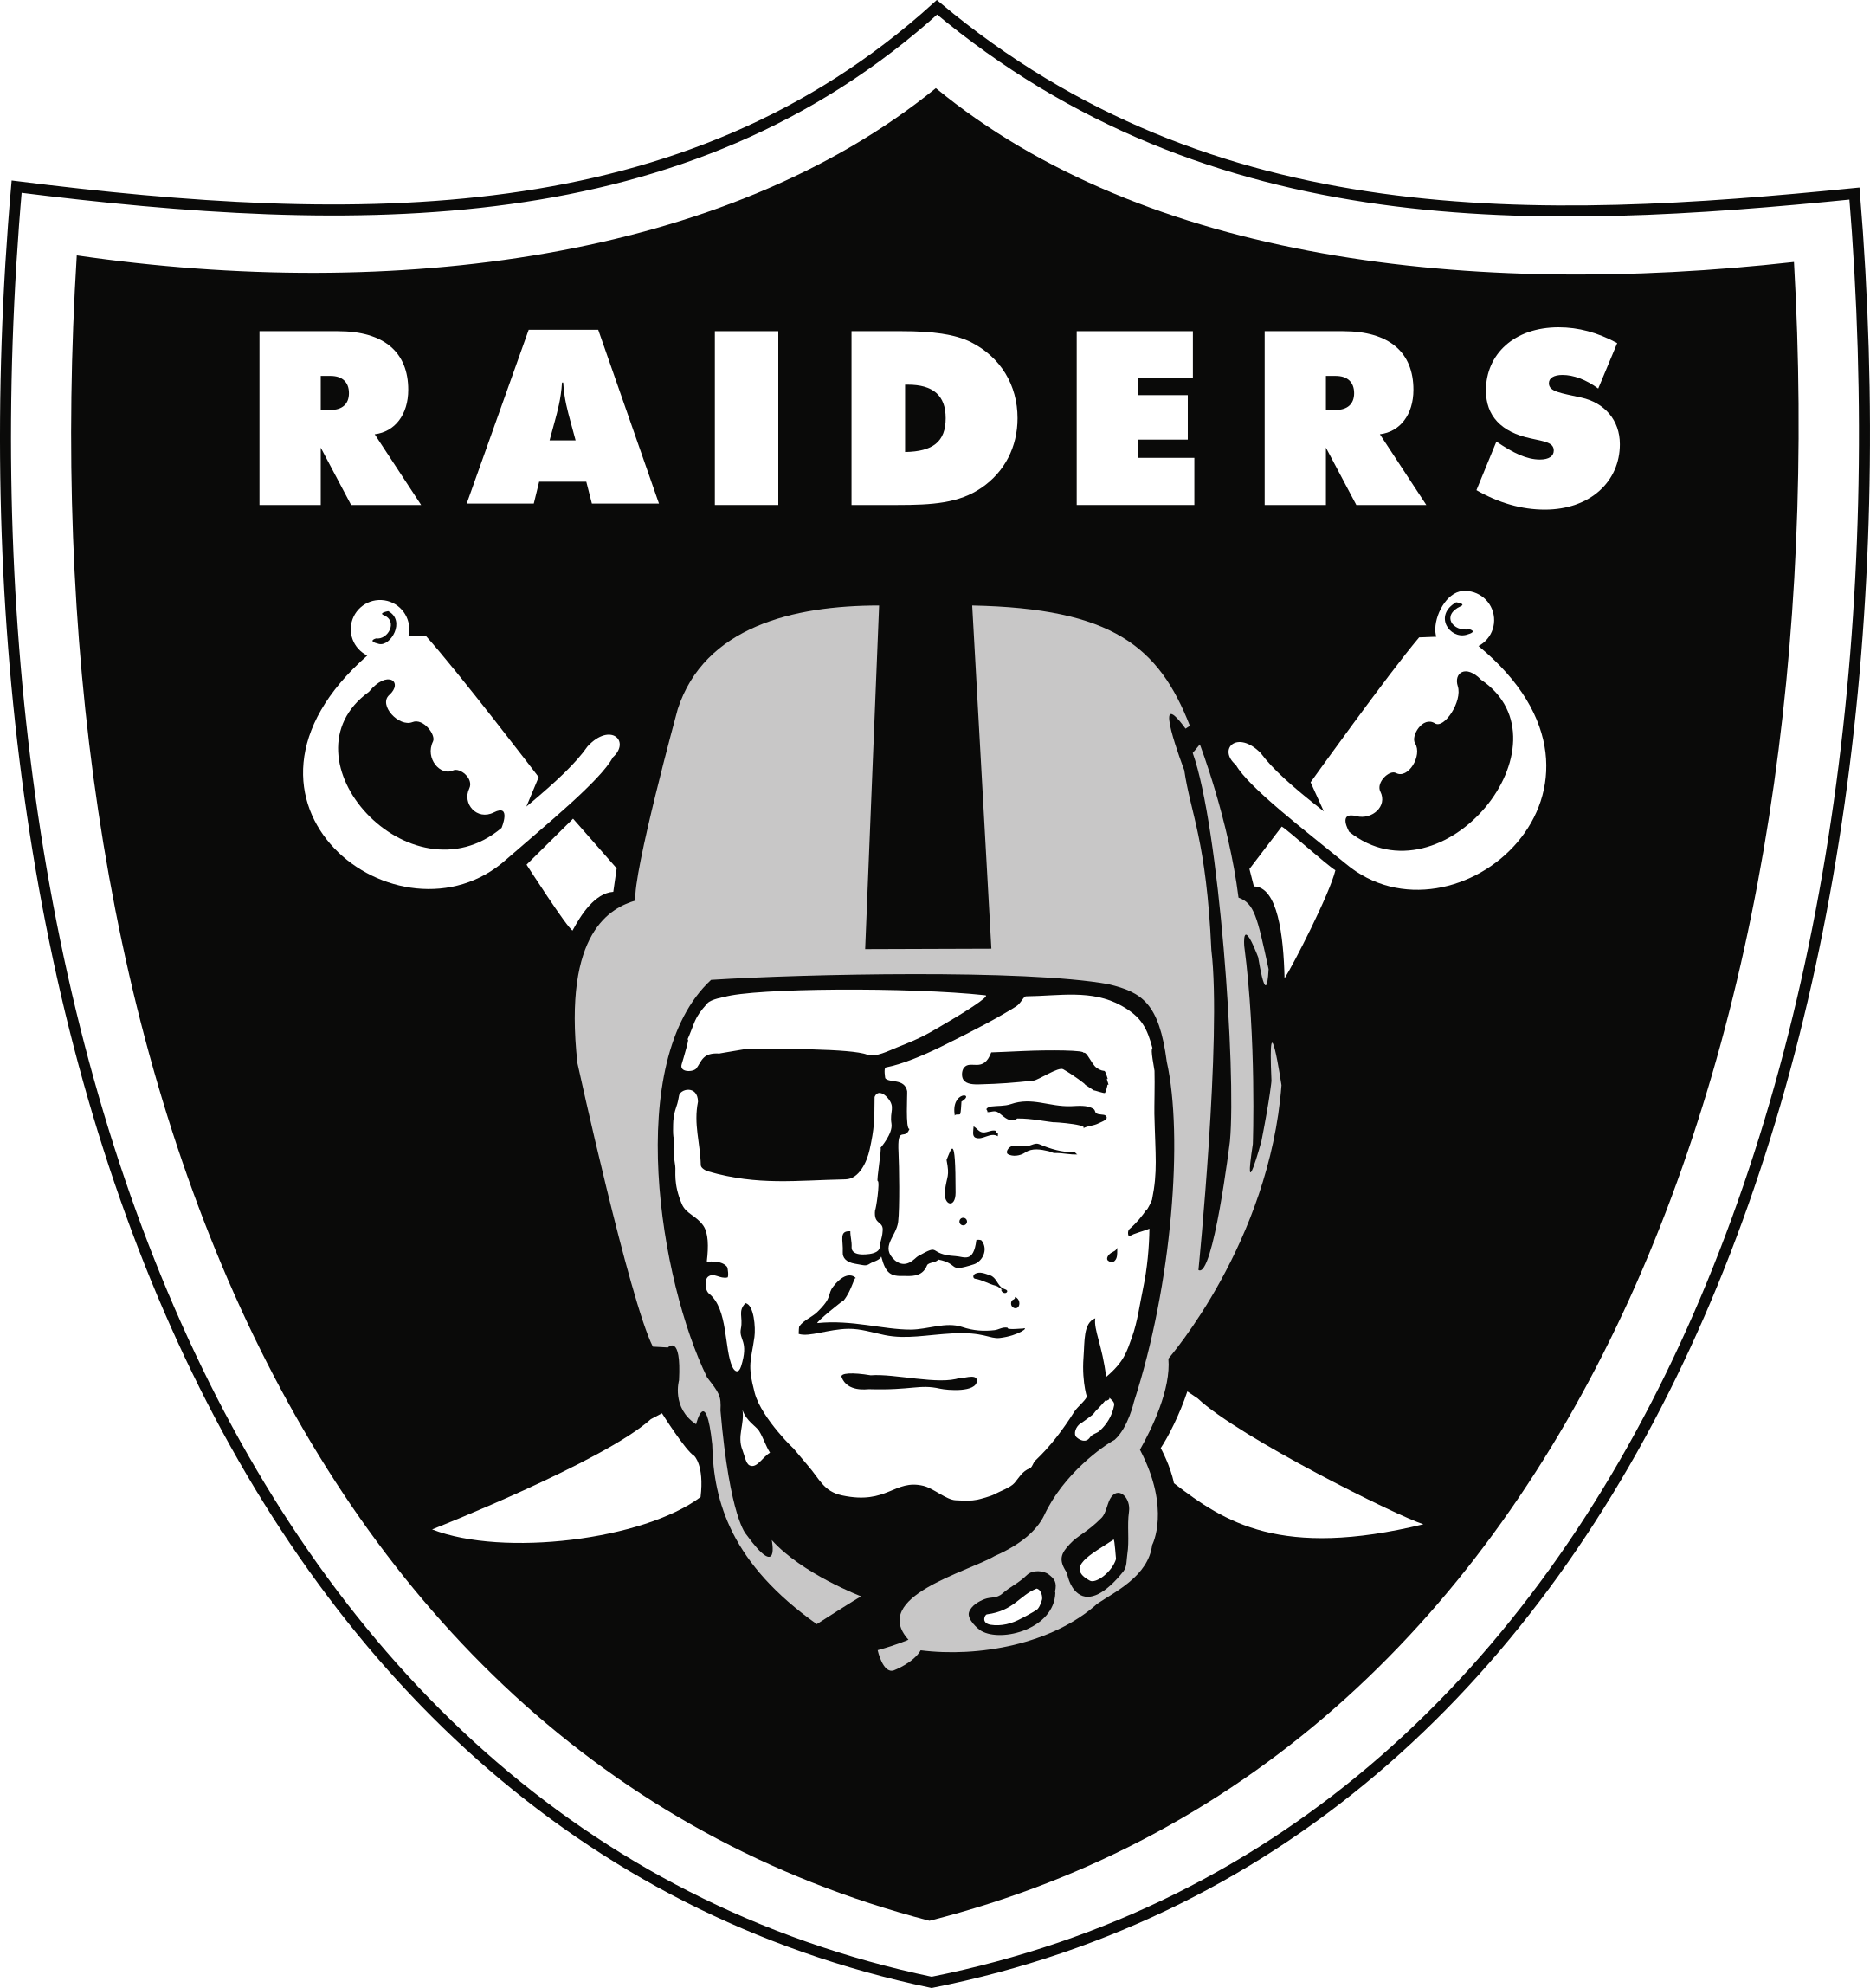 las vegas raiders logo 1 - Las Vegas Raiders Logo